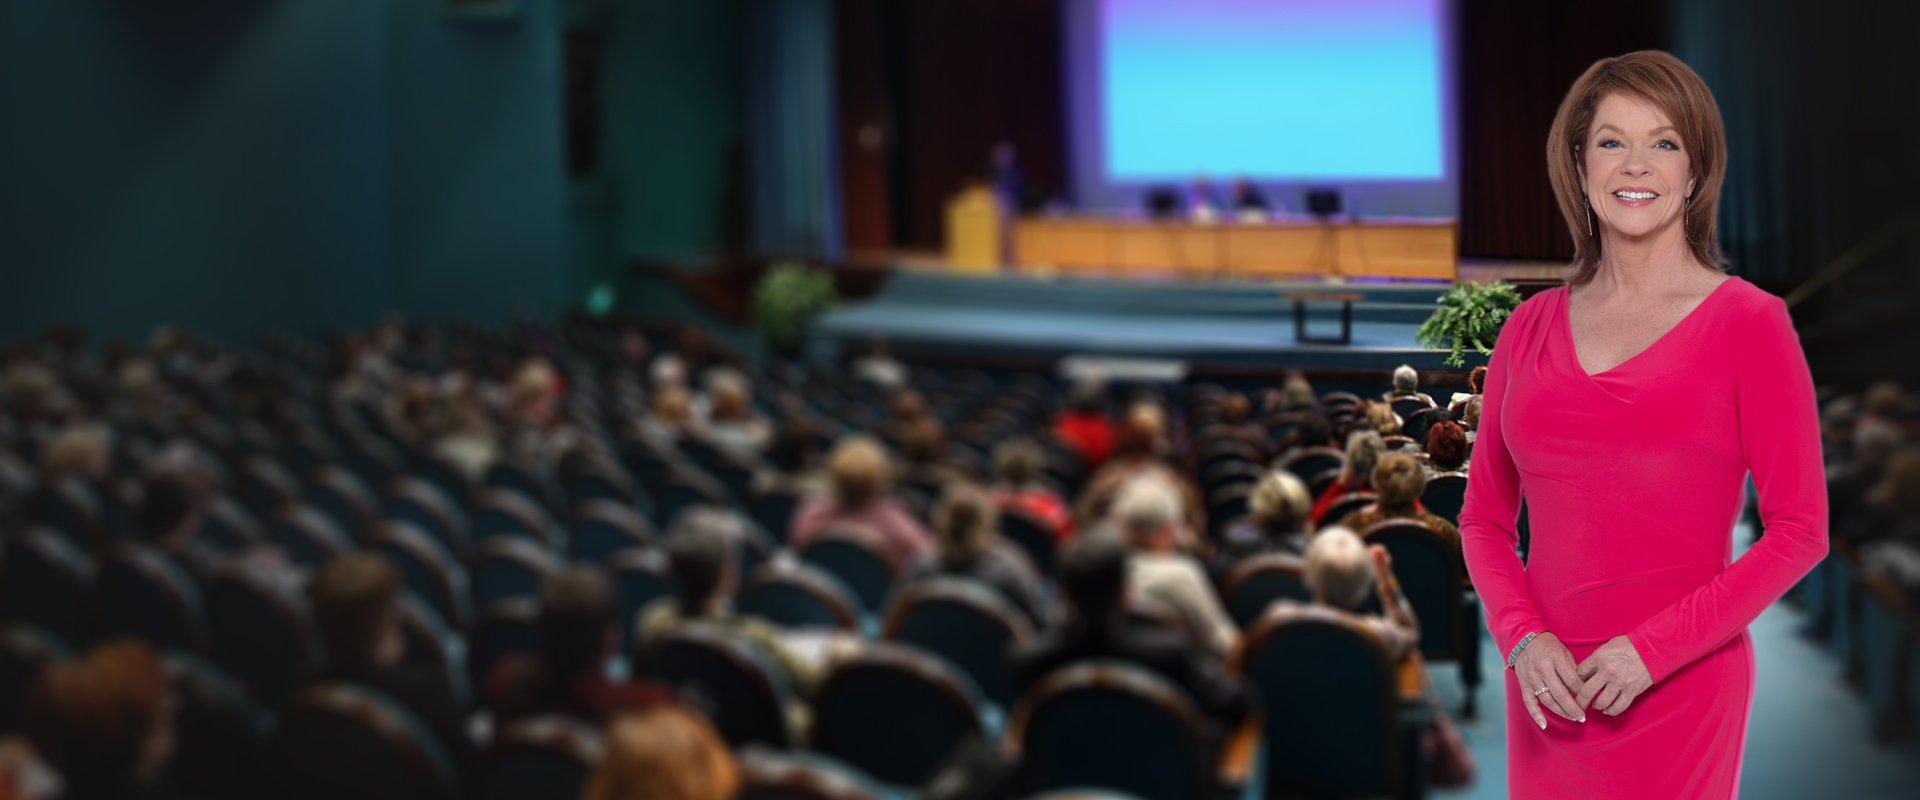 Keynote Speaker Dr. Kim Nugents Topics & Presentations